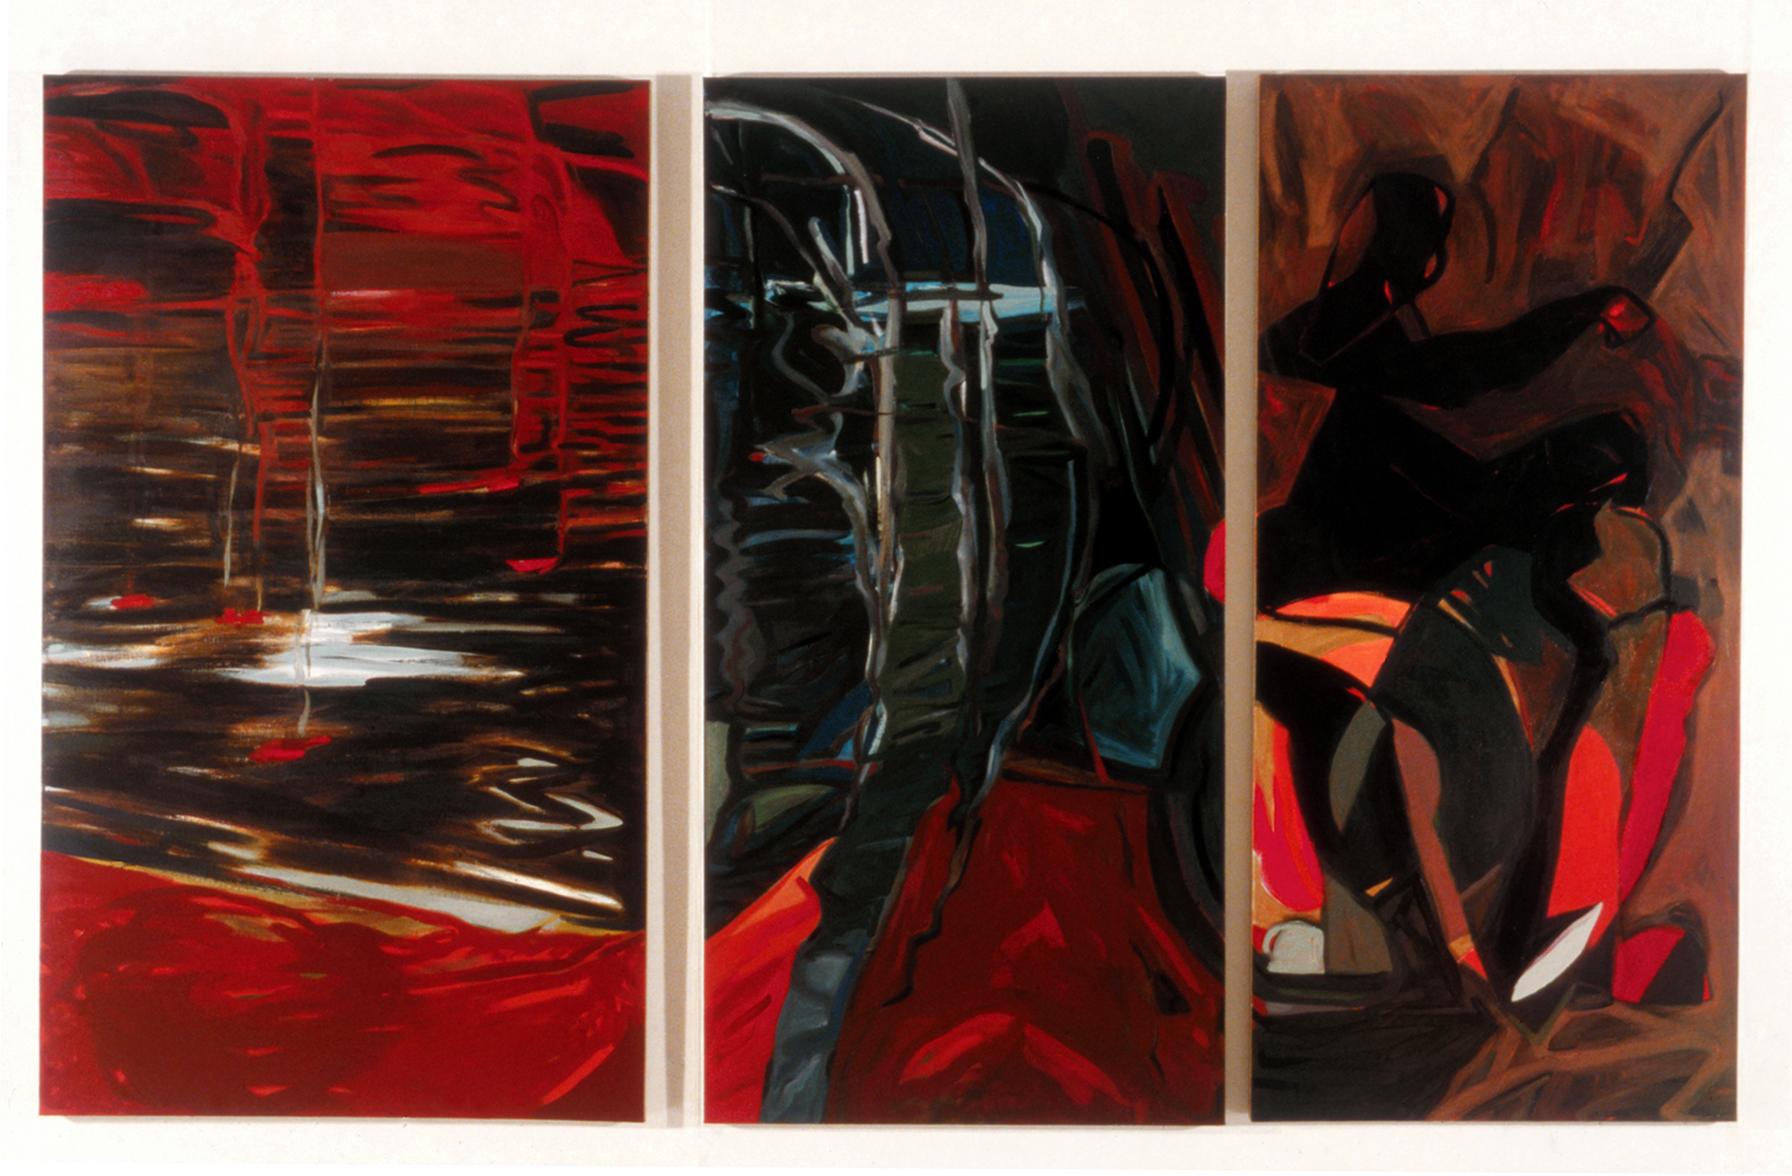 146 Plotek Leopold Marsyas apollo the river triptych 2000 138249.jpg